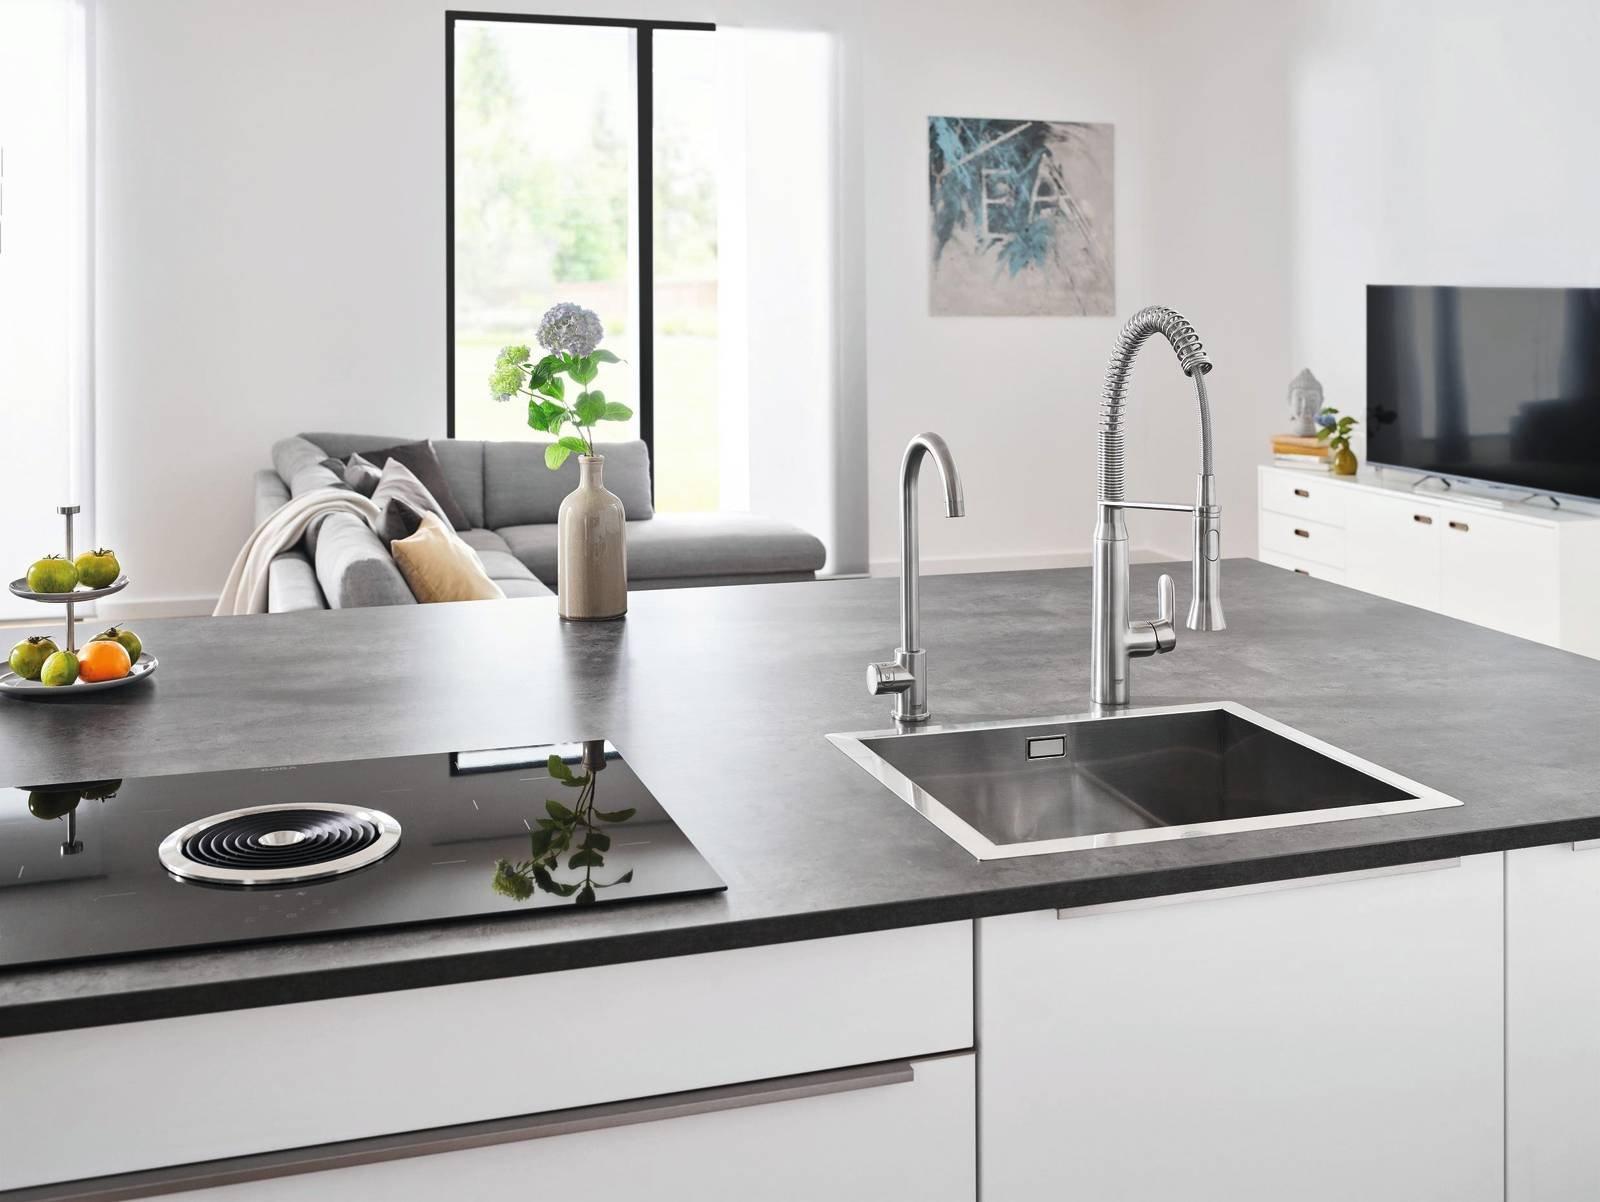 rubinetti per la cucina miscelatori hi tech cose di casa. Black Bedroom Furniture Sets. Home Design Ideas